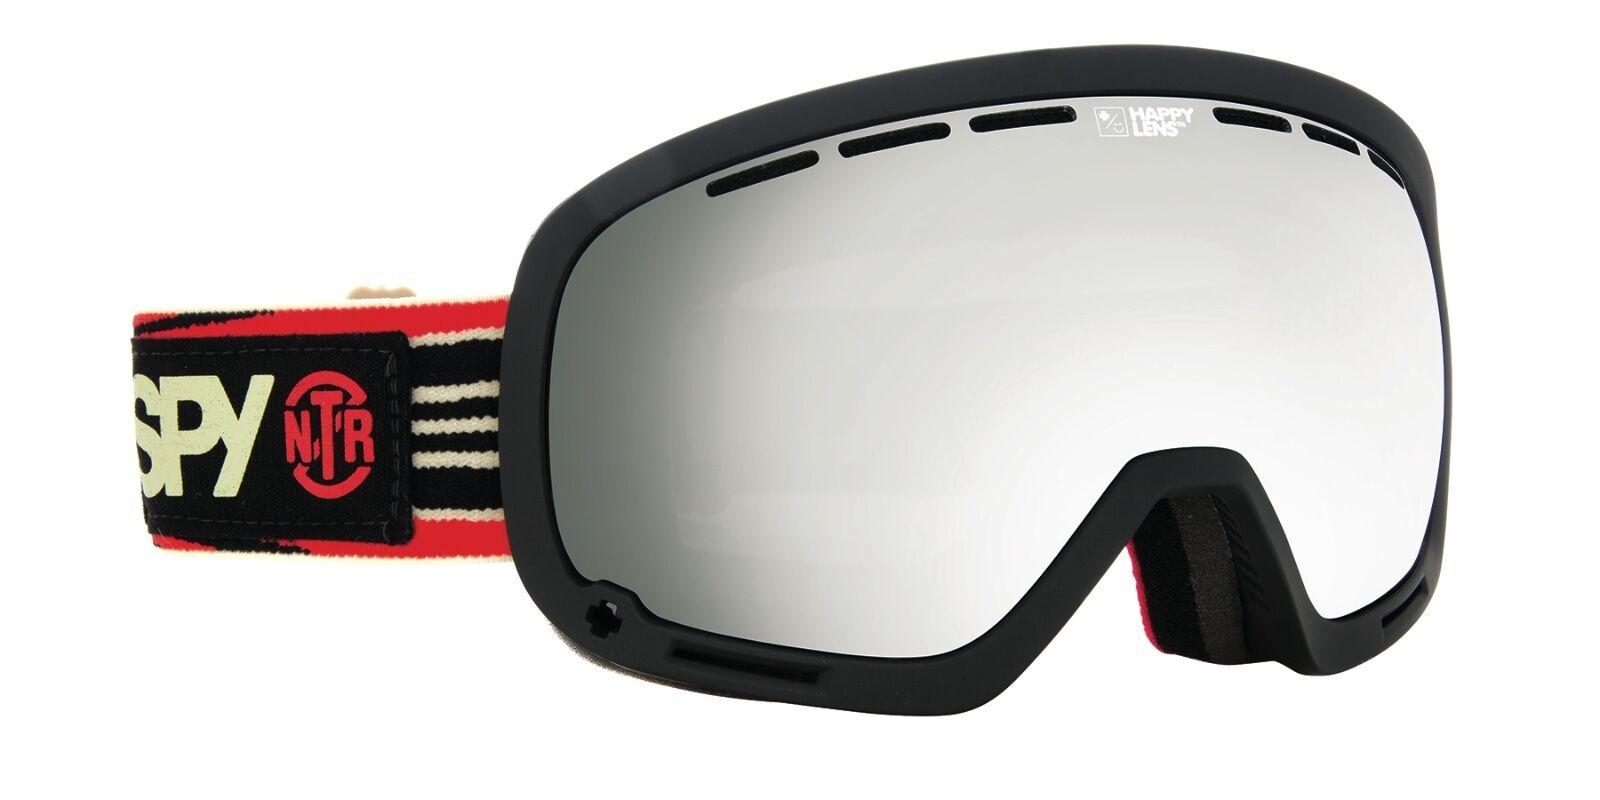 new in box marshall spy ntr snowboard